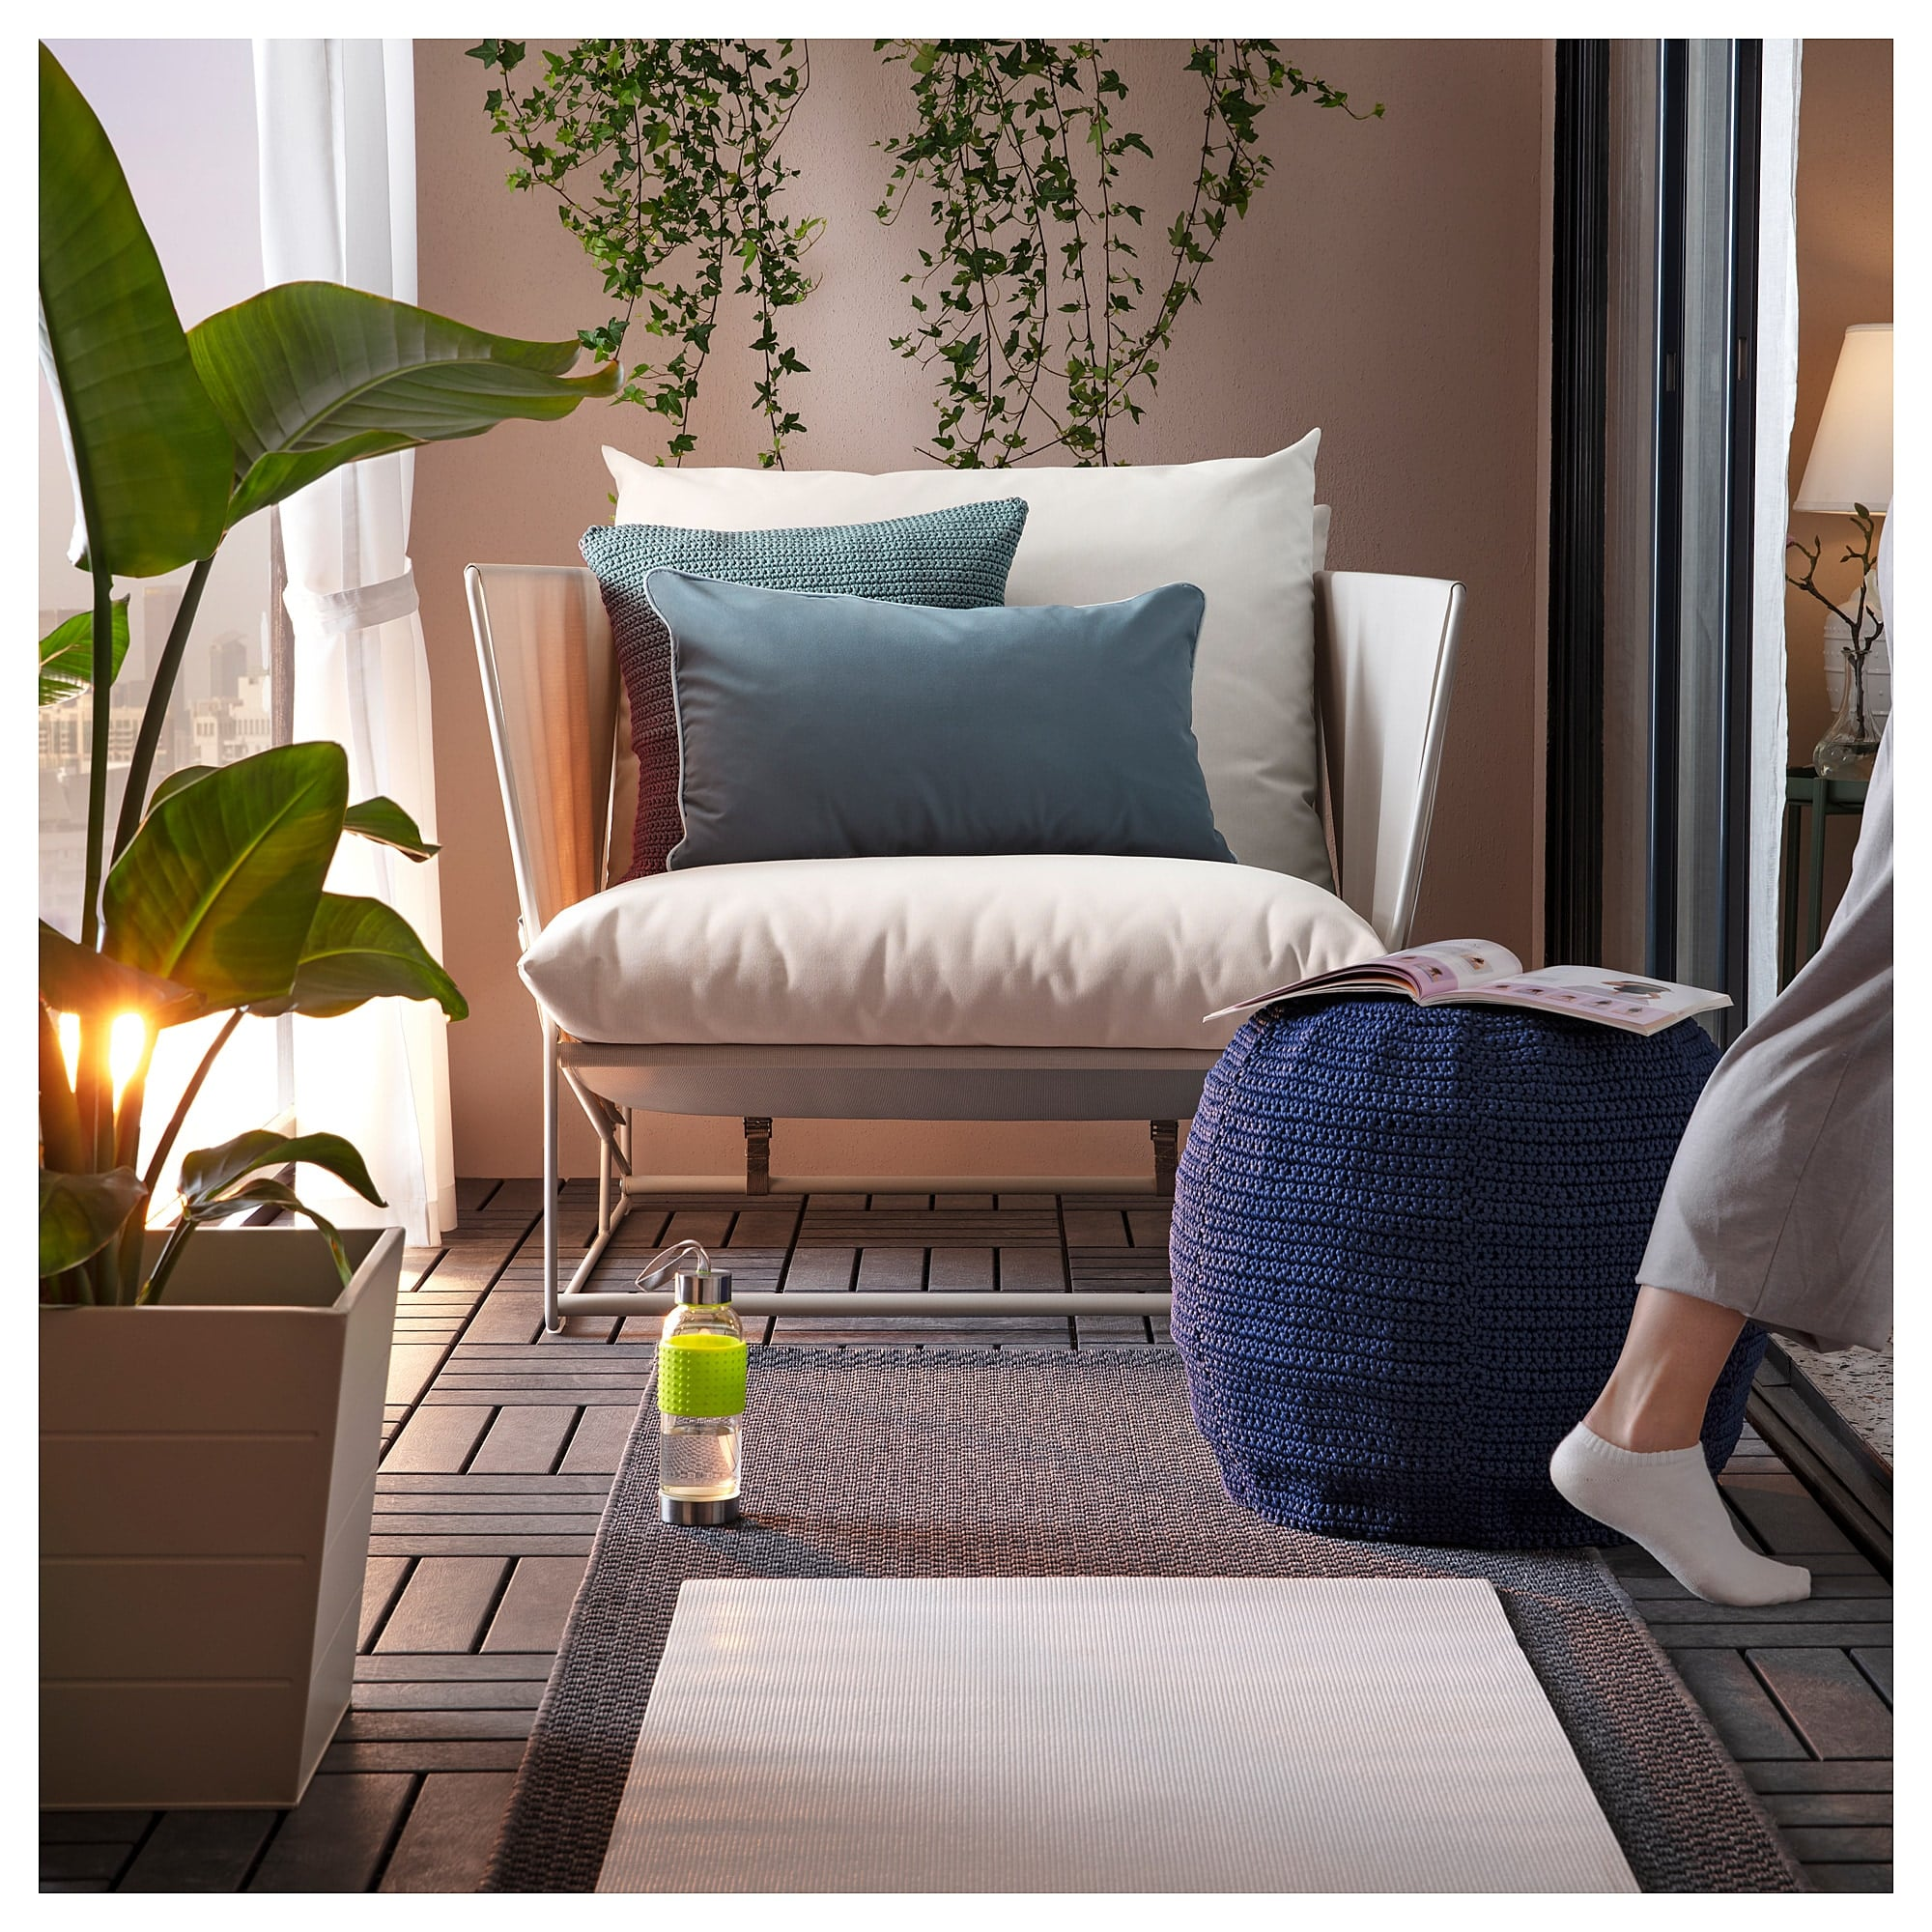 Best Dorm Room Furniture From Ikea Popsugar Home